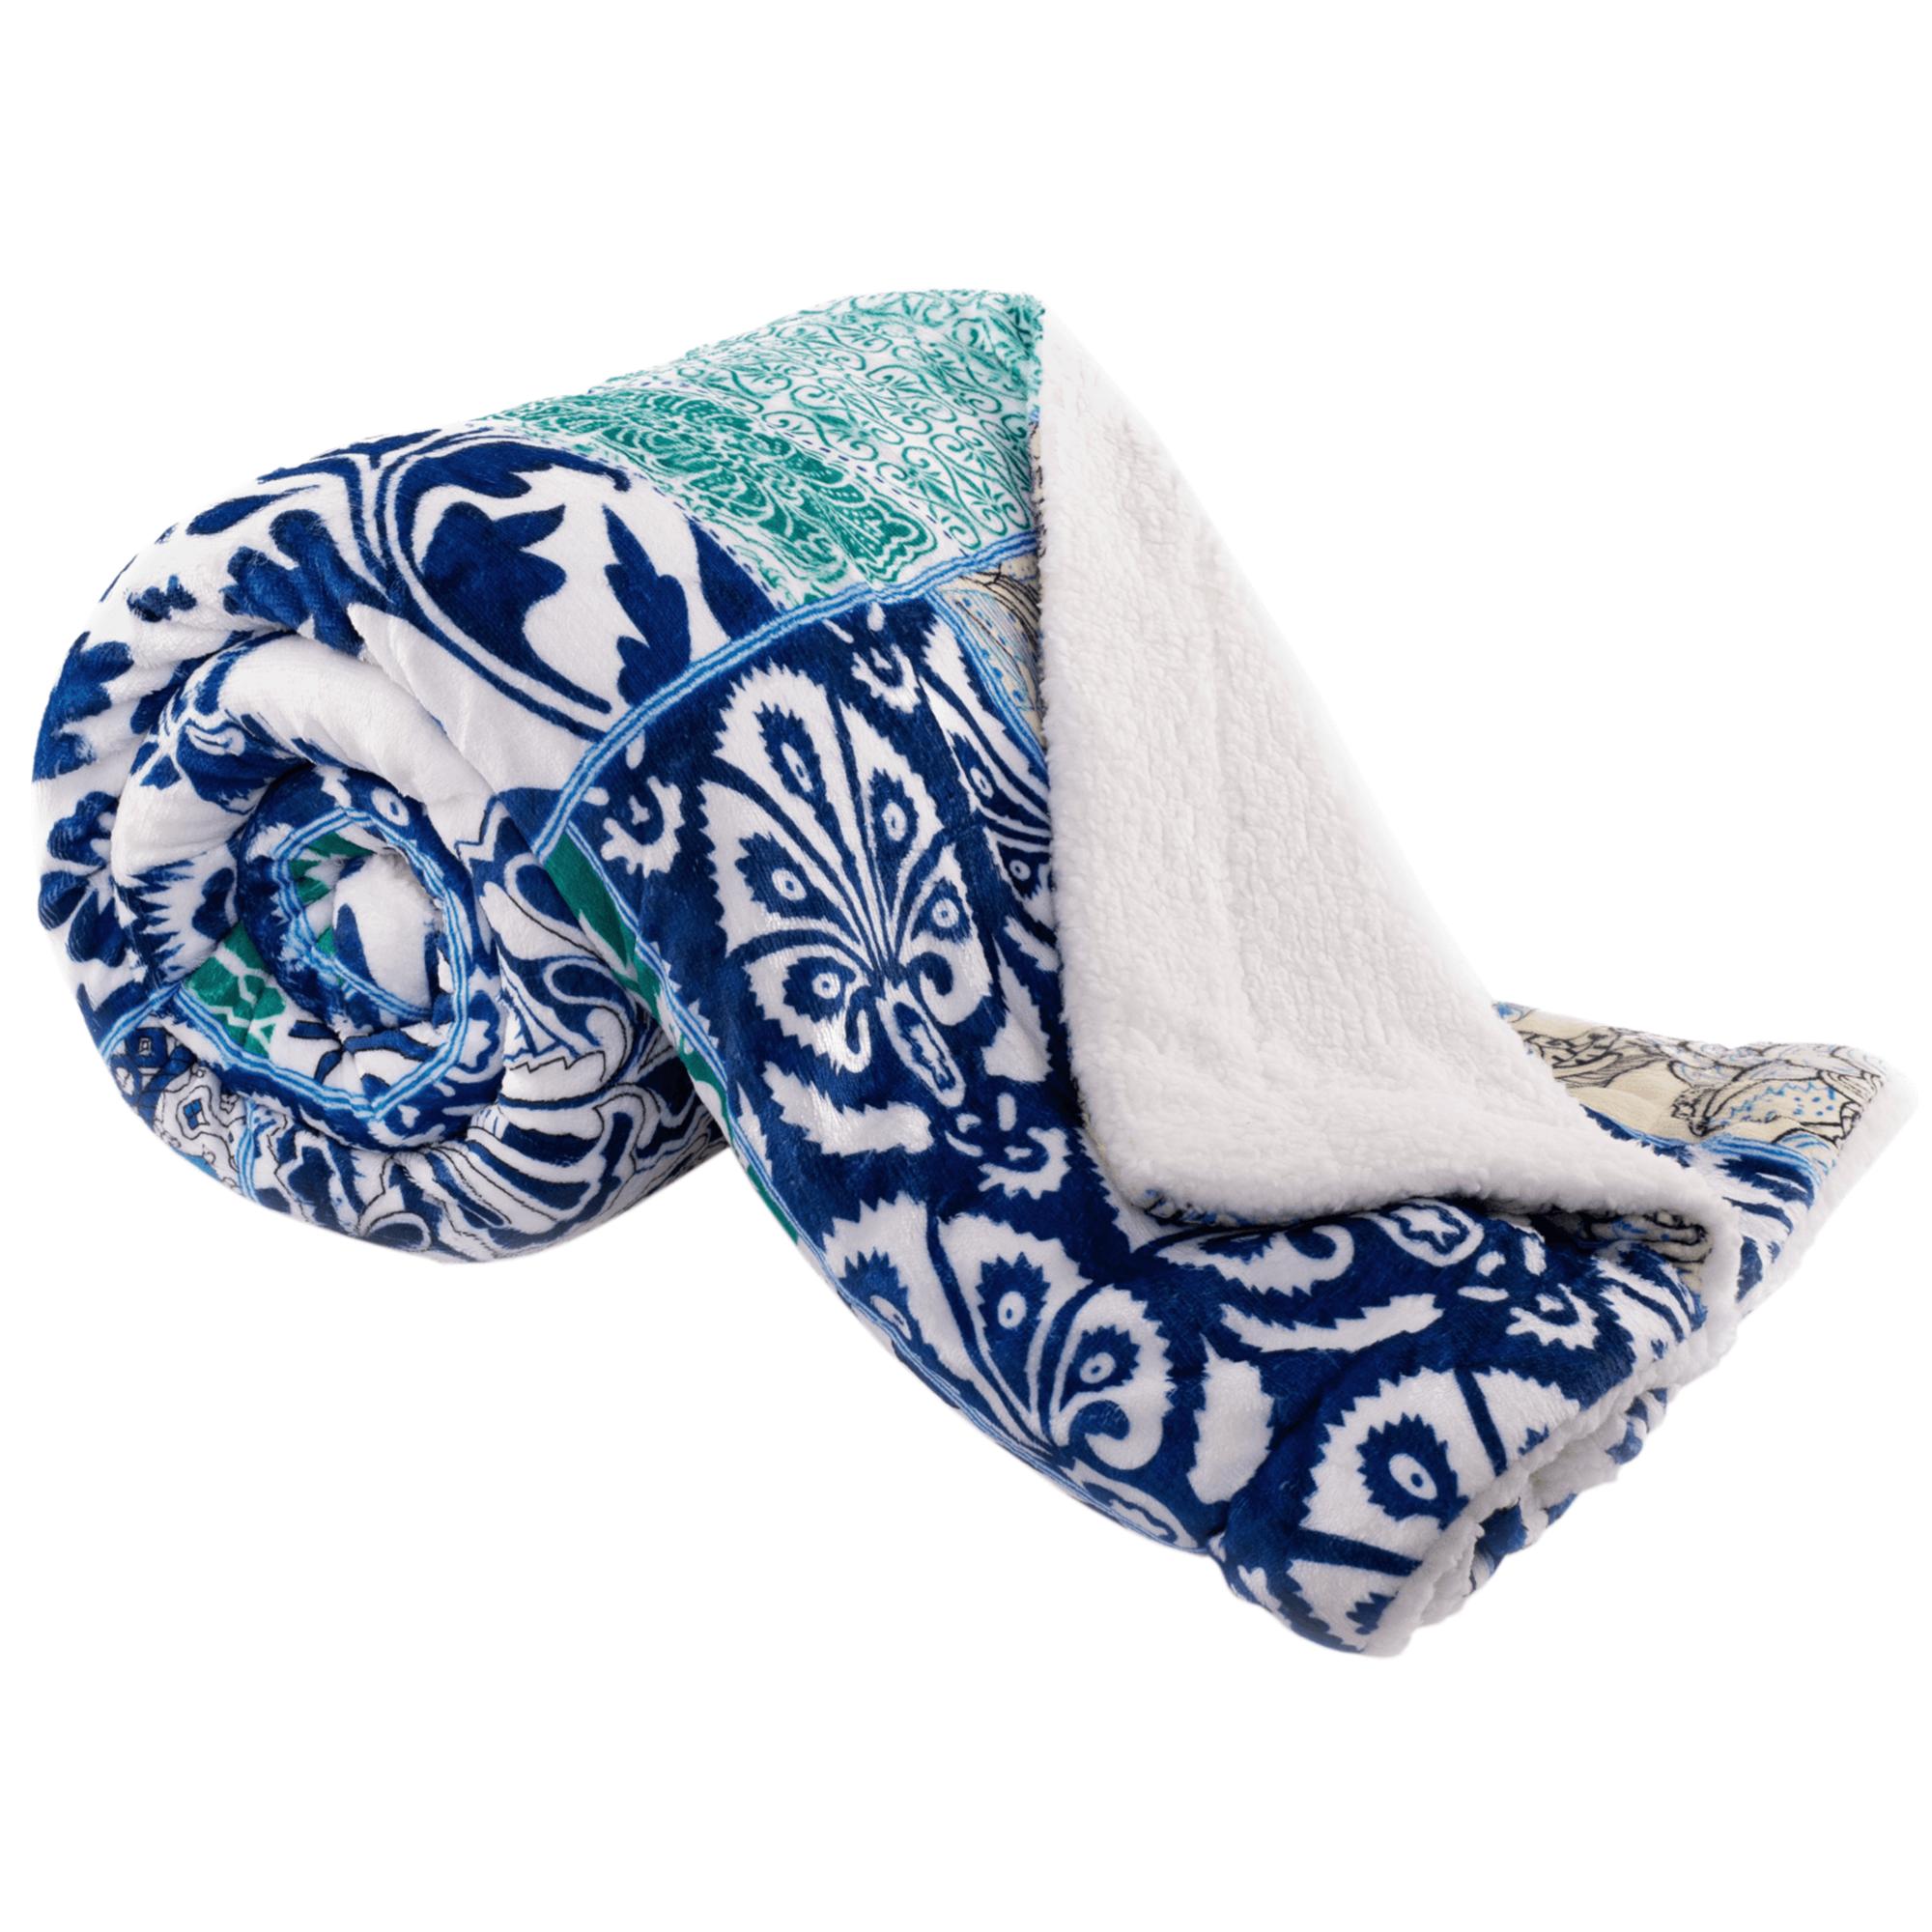 Obojstranná baránková deka, modrá/zelená/vzor, 150x200cm, VILNUS TYP1